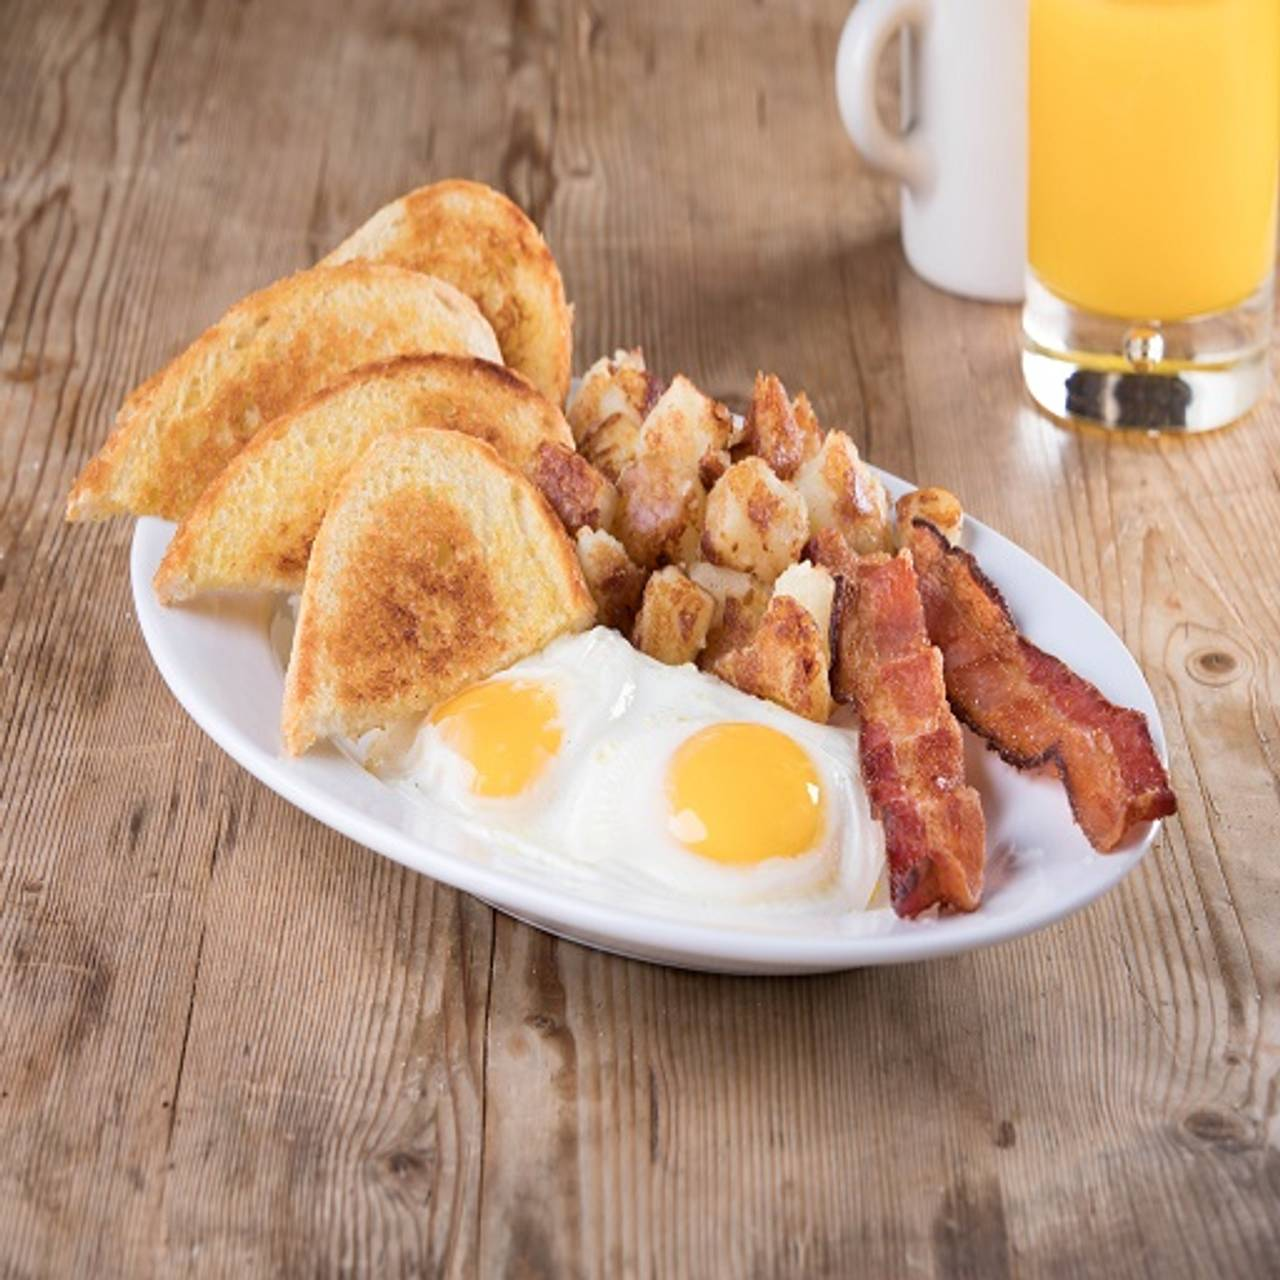 Double Down Breakfast Kings Family Restaurant Sierra North Plaza Altoona Pa